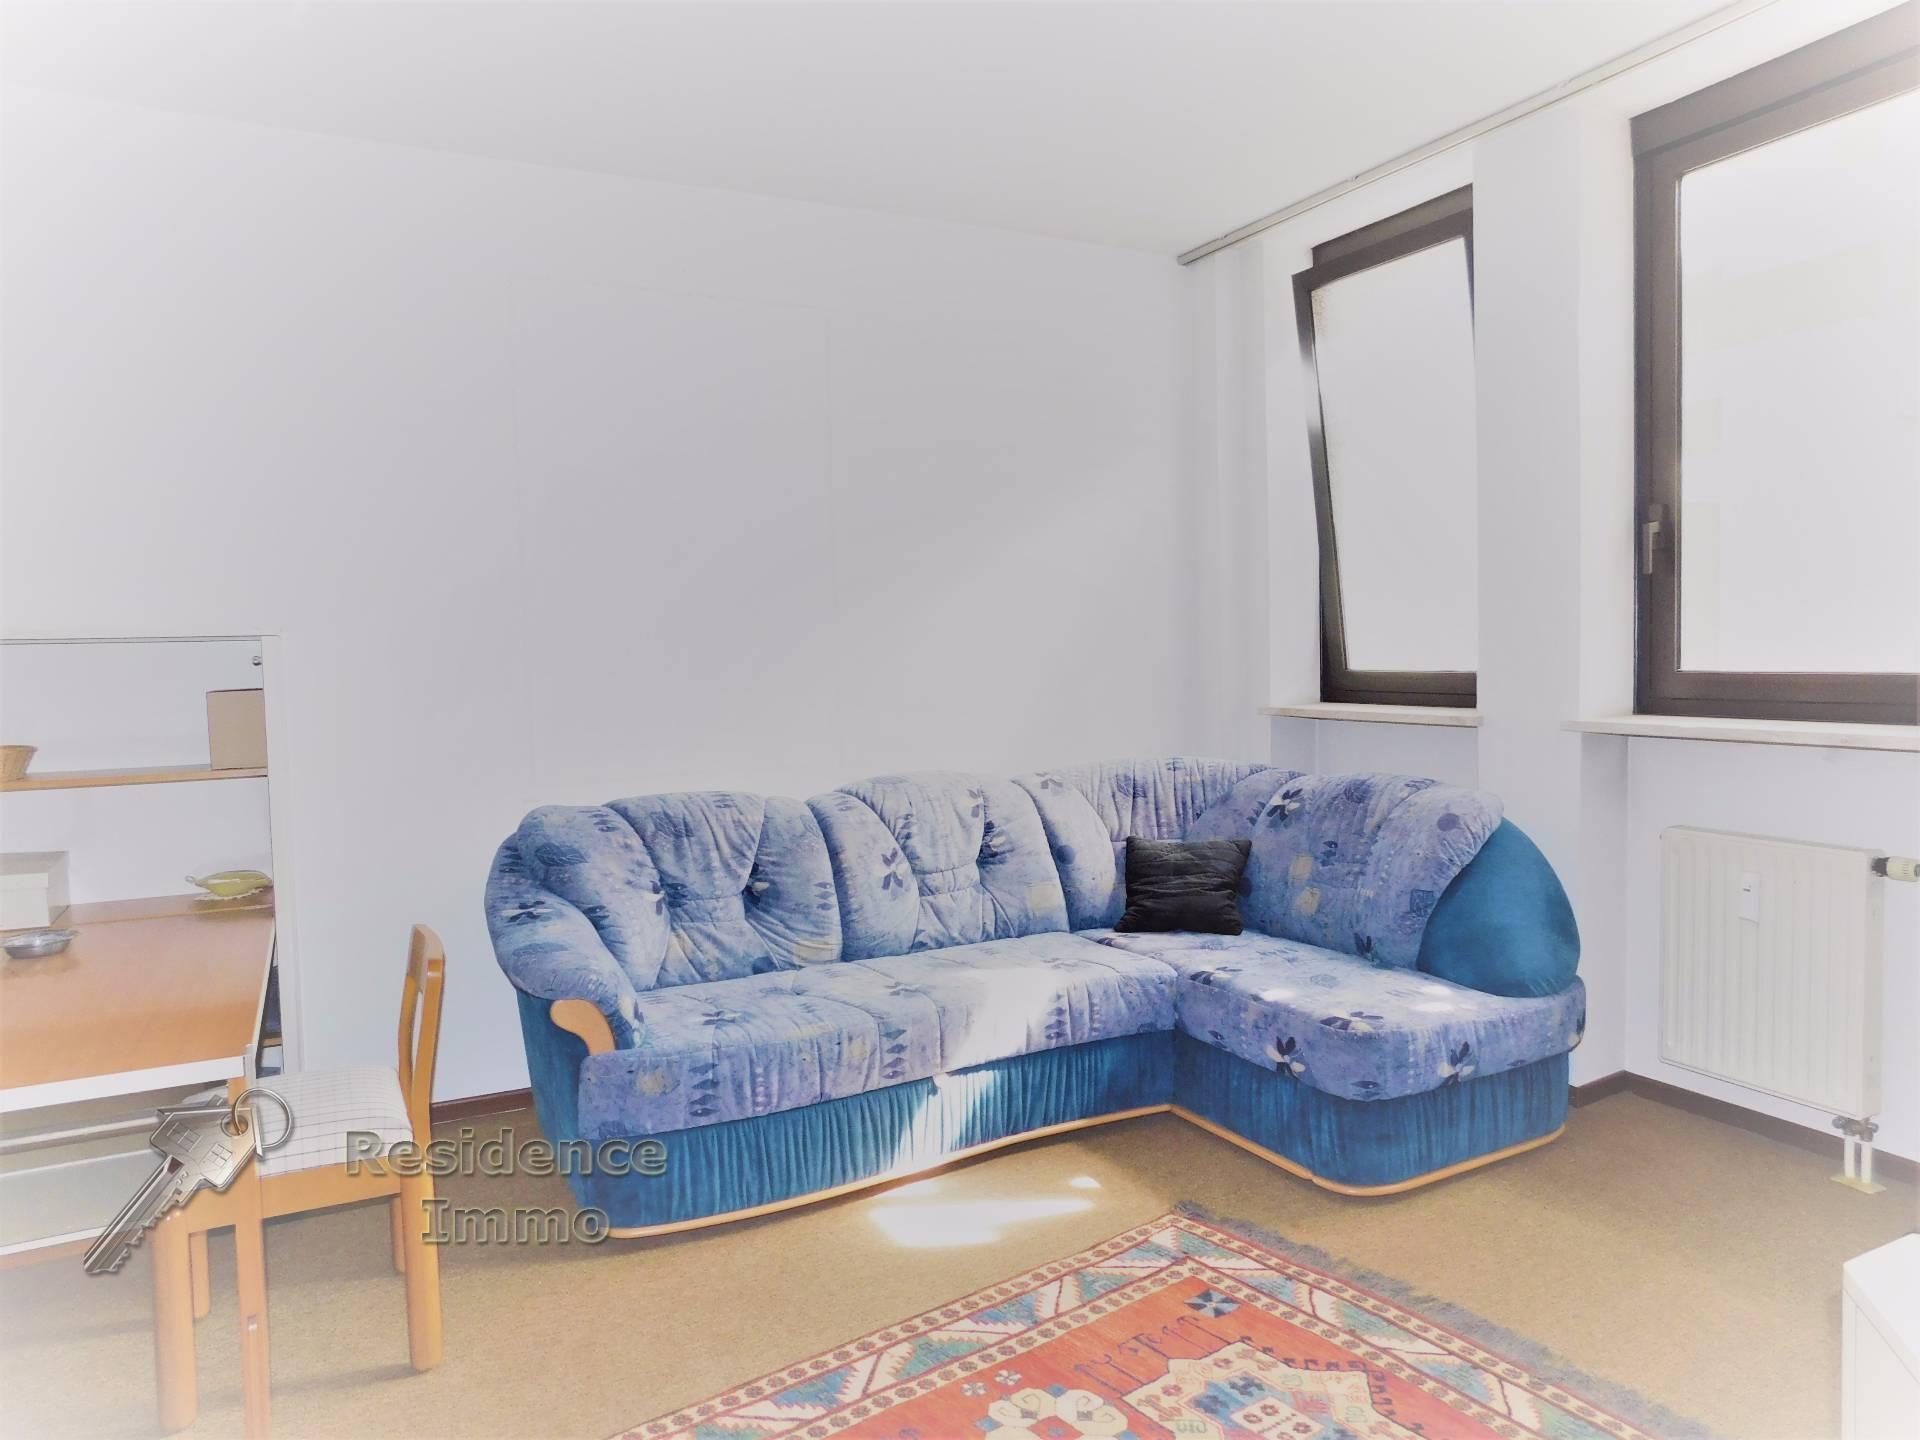 wohnung kaufen in bolzano bozen kodex 2064. Black Bedroom Furniture Sets. Home Design Ideas